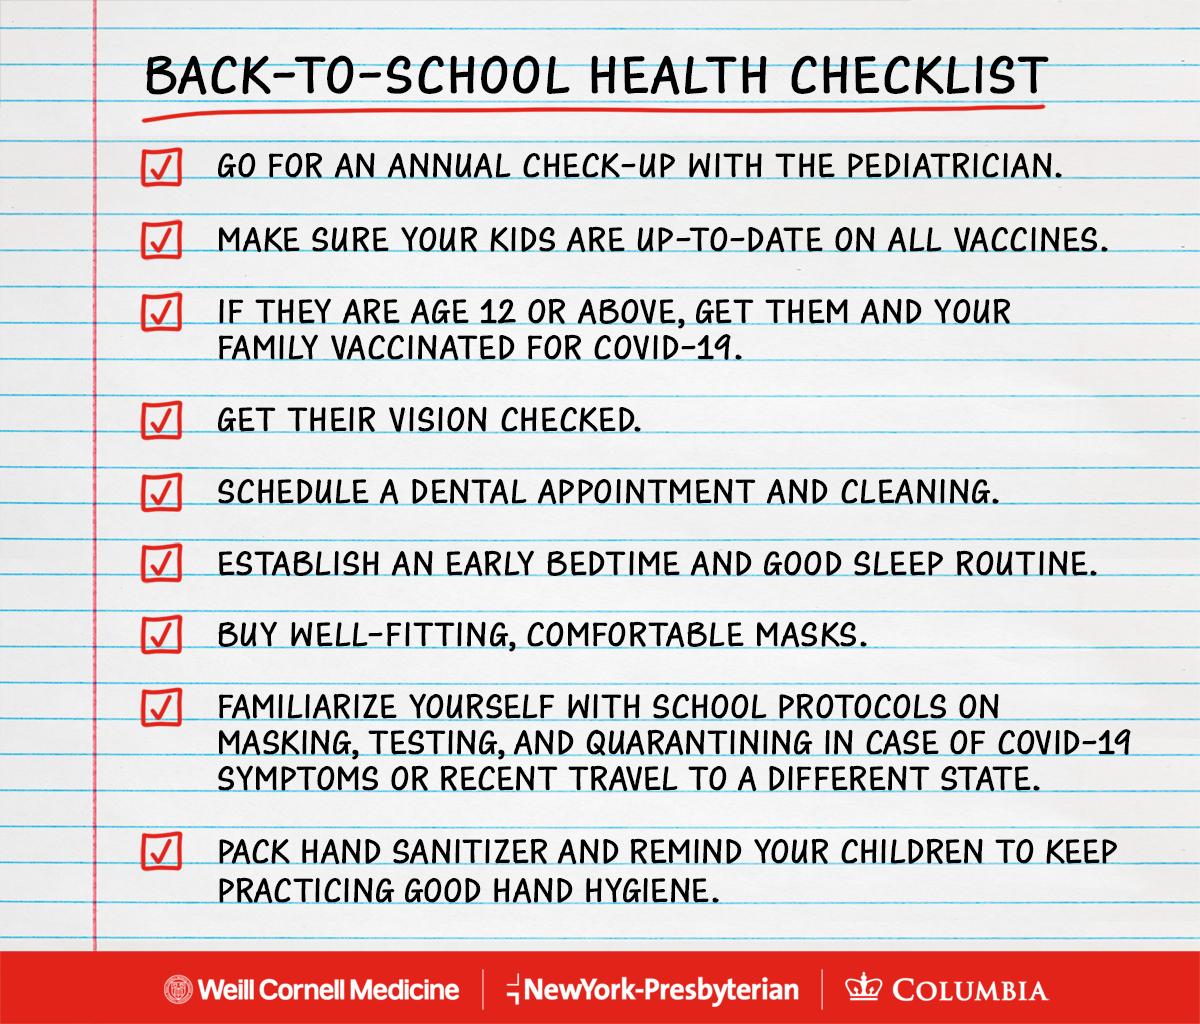 Back to school health checklist